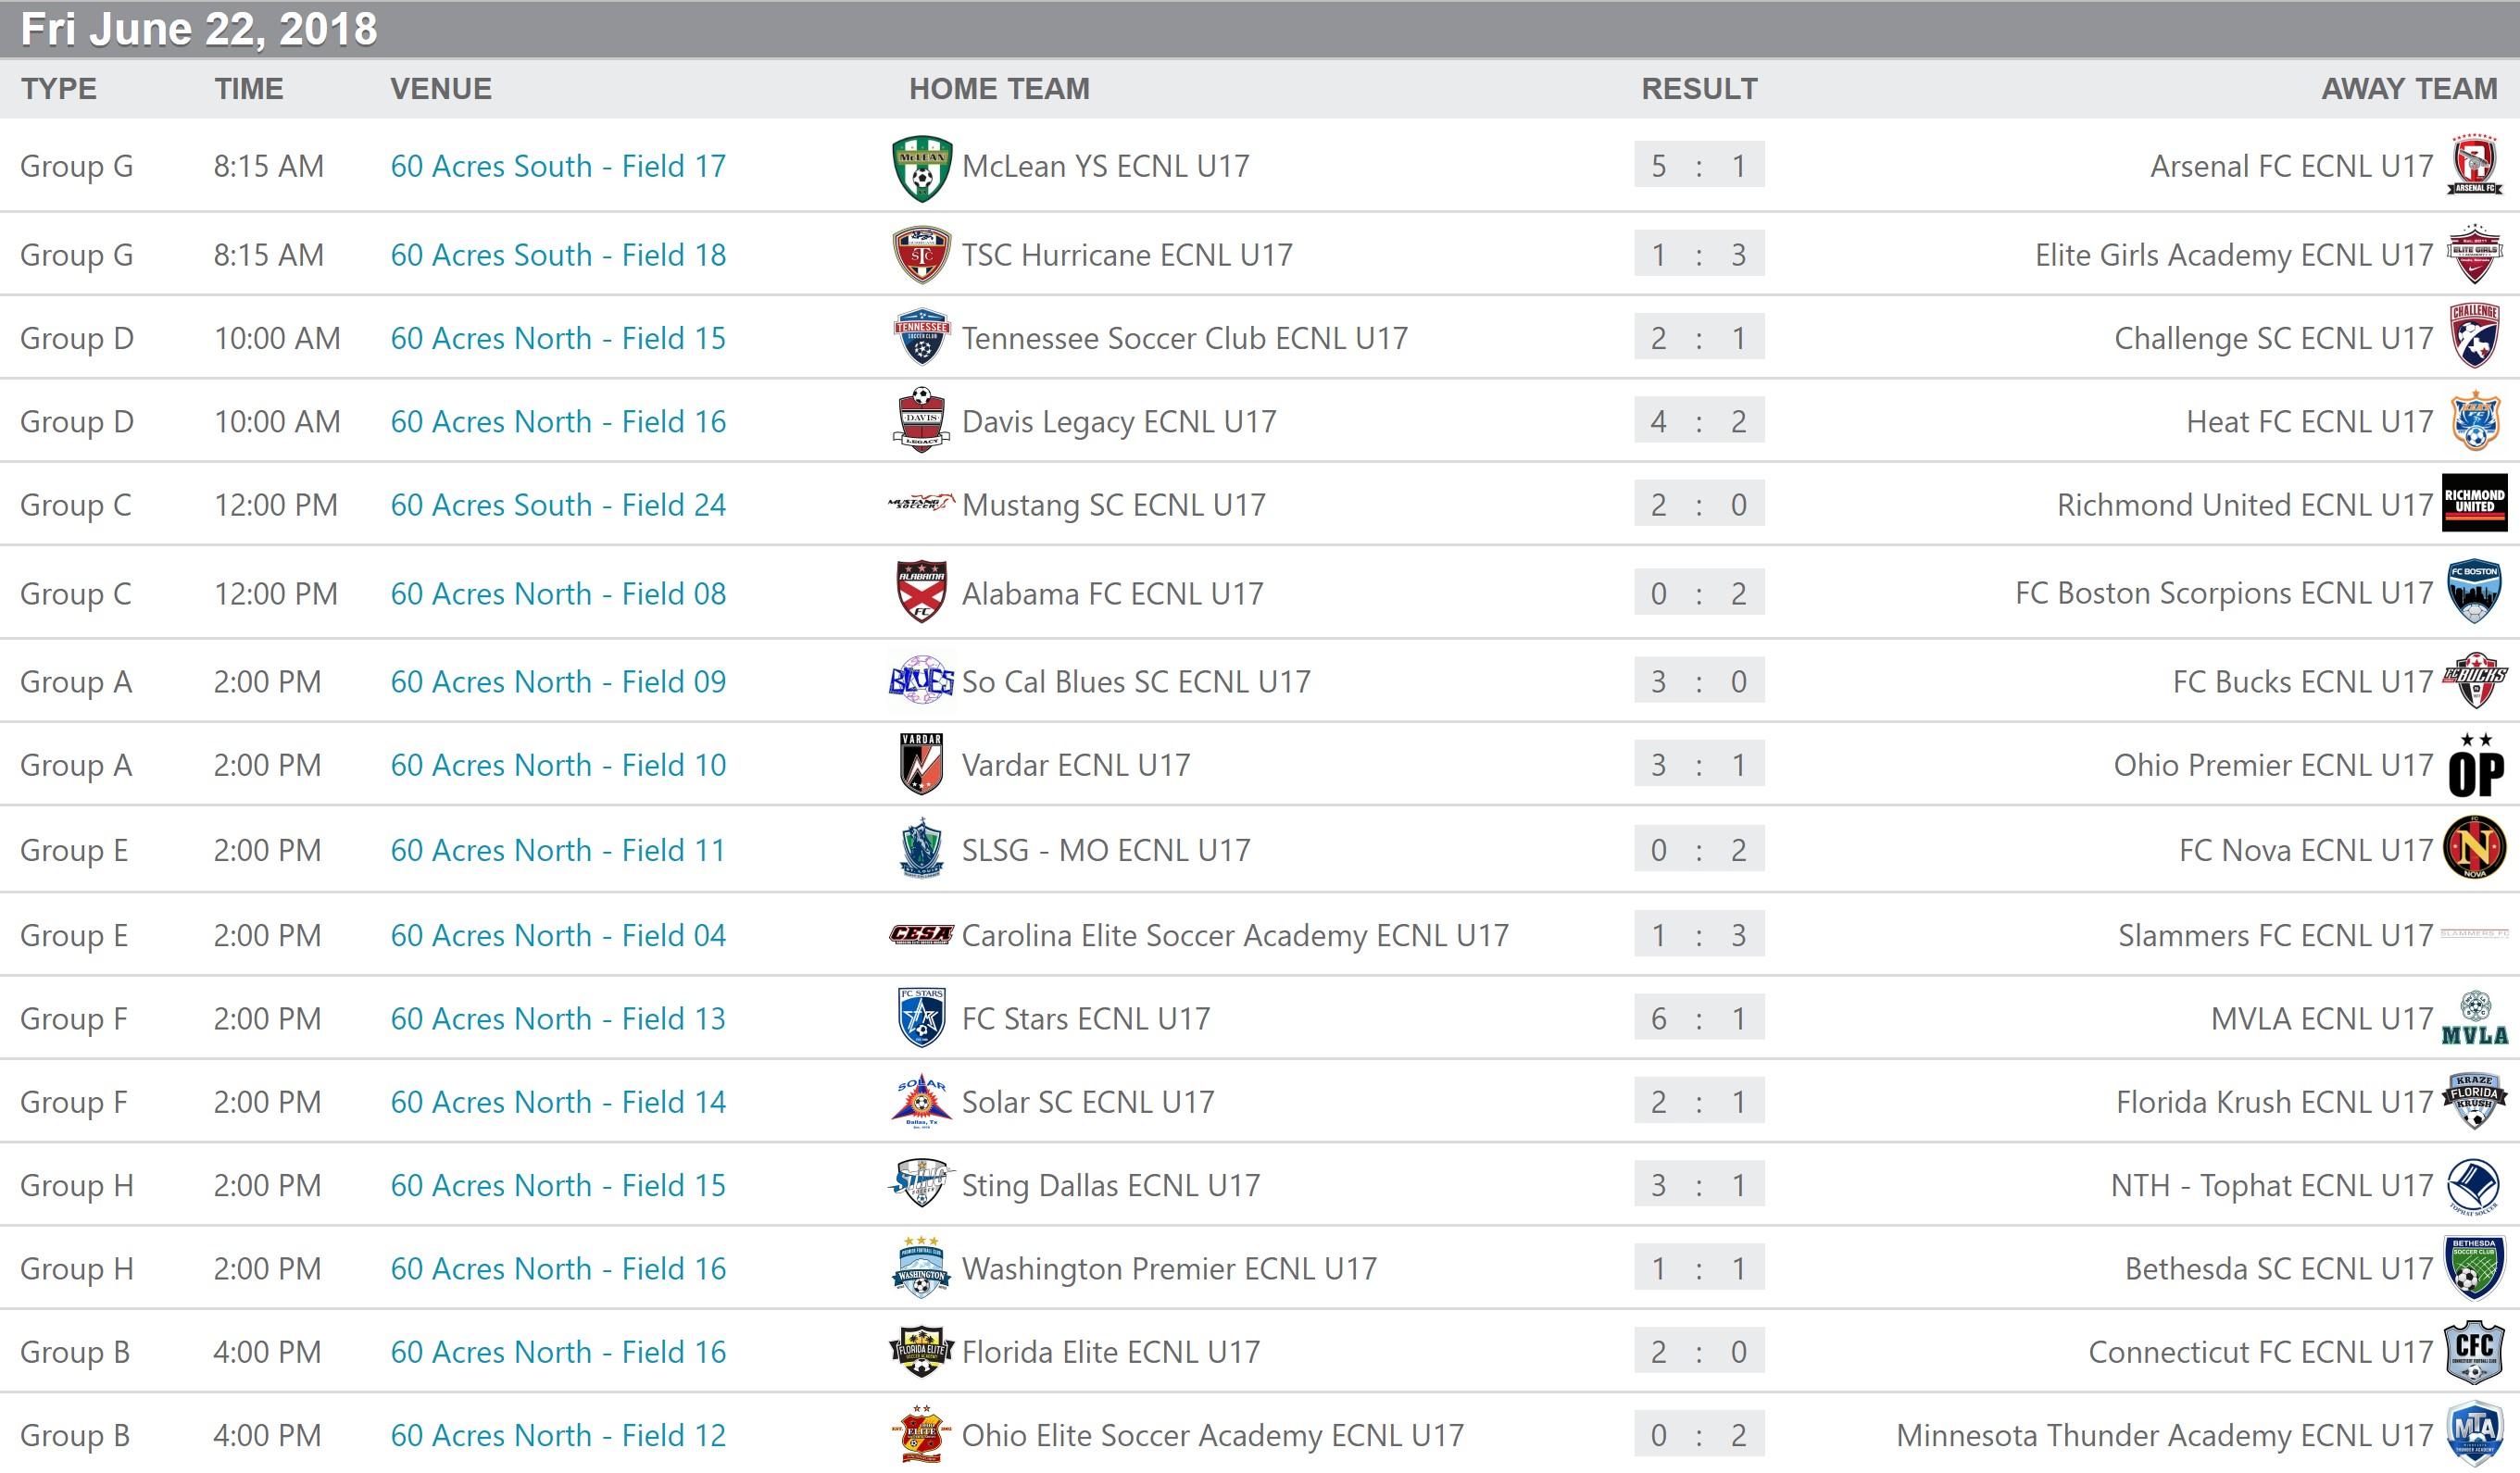 U17 ECNL scores